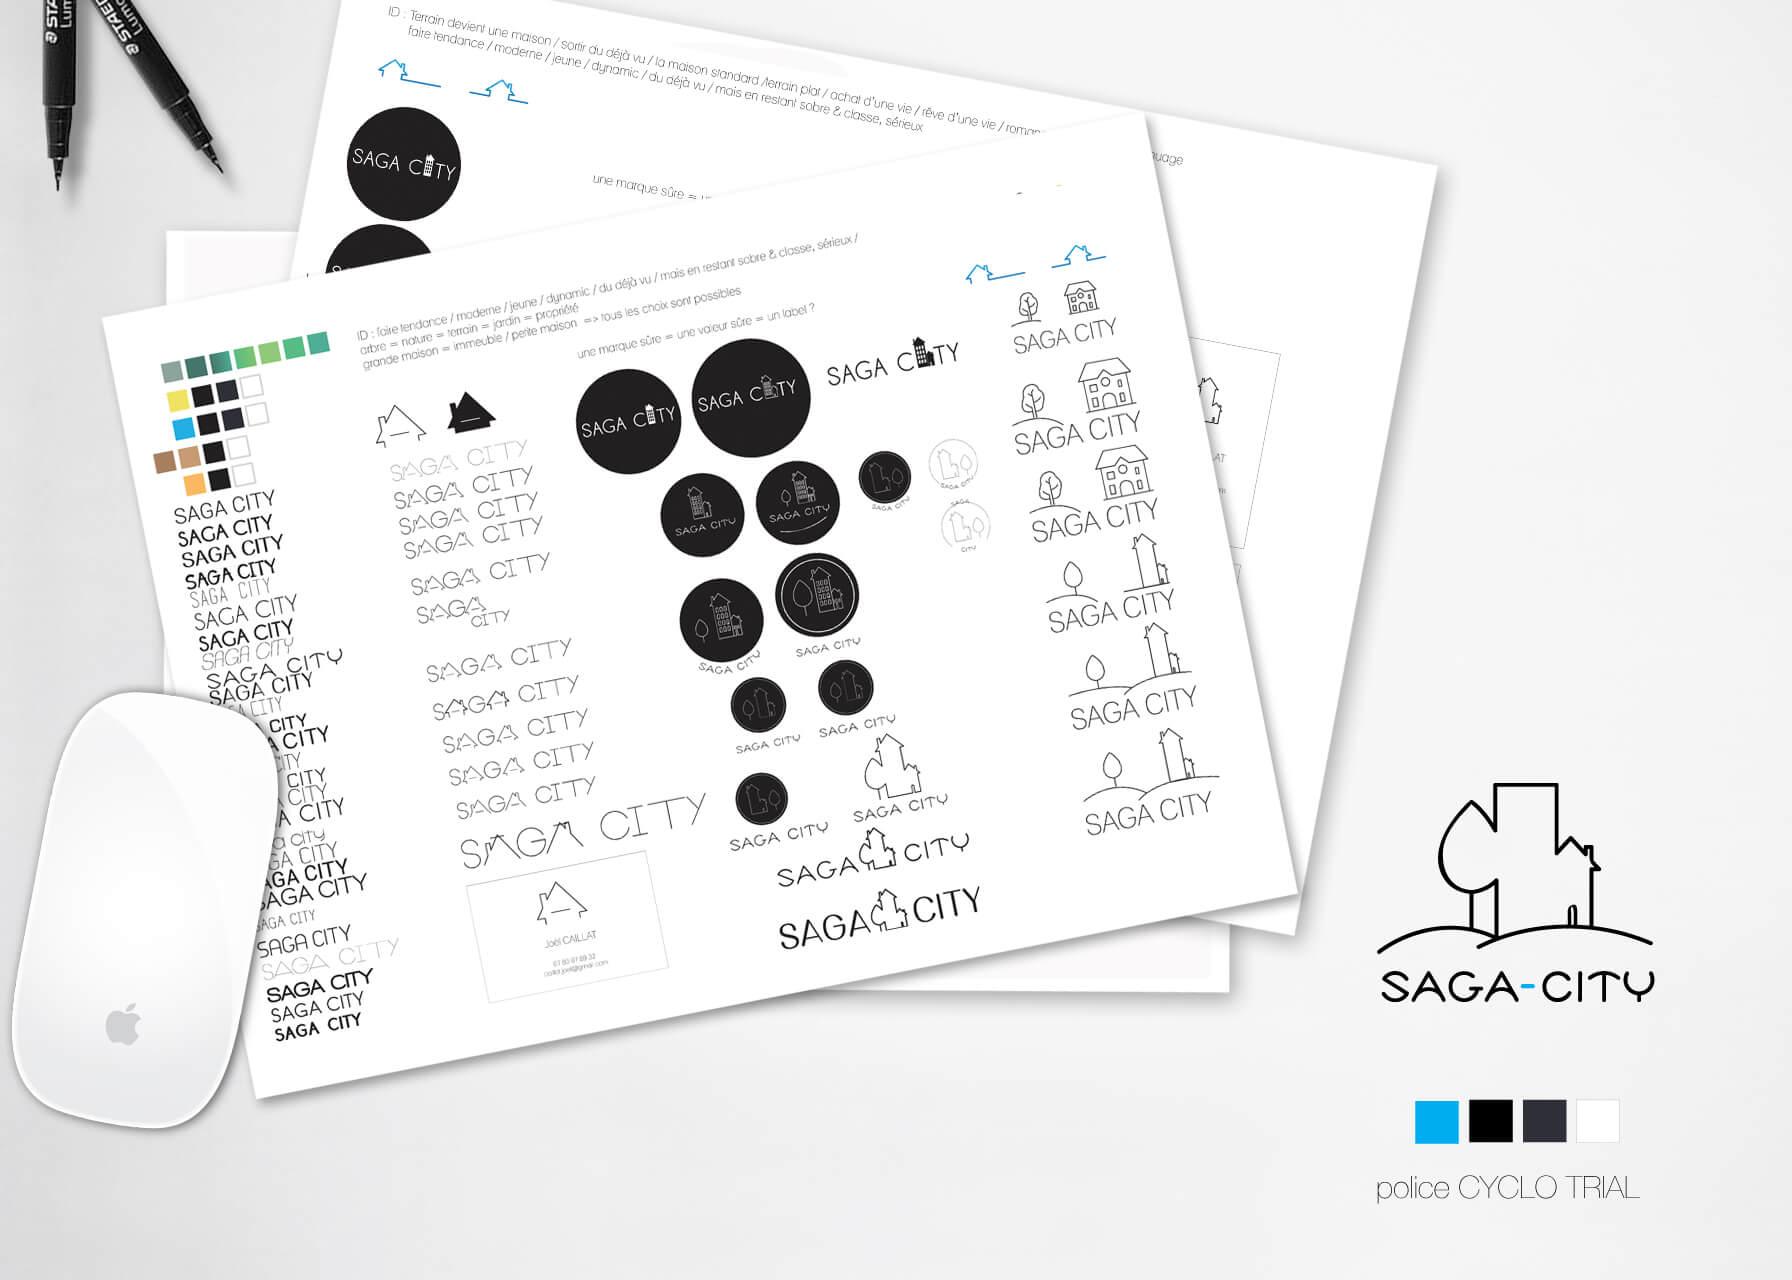 planches recherches charte graphique SAGA-CITY